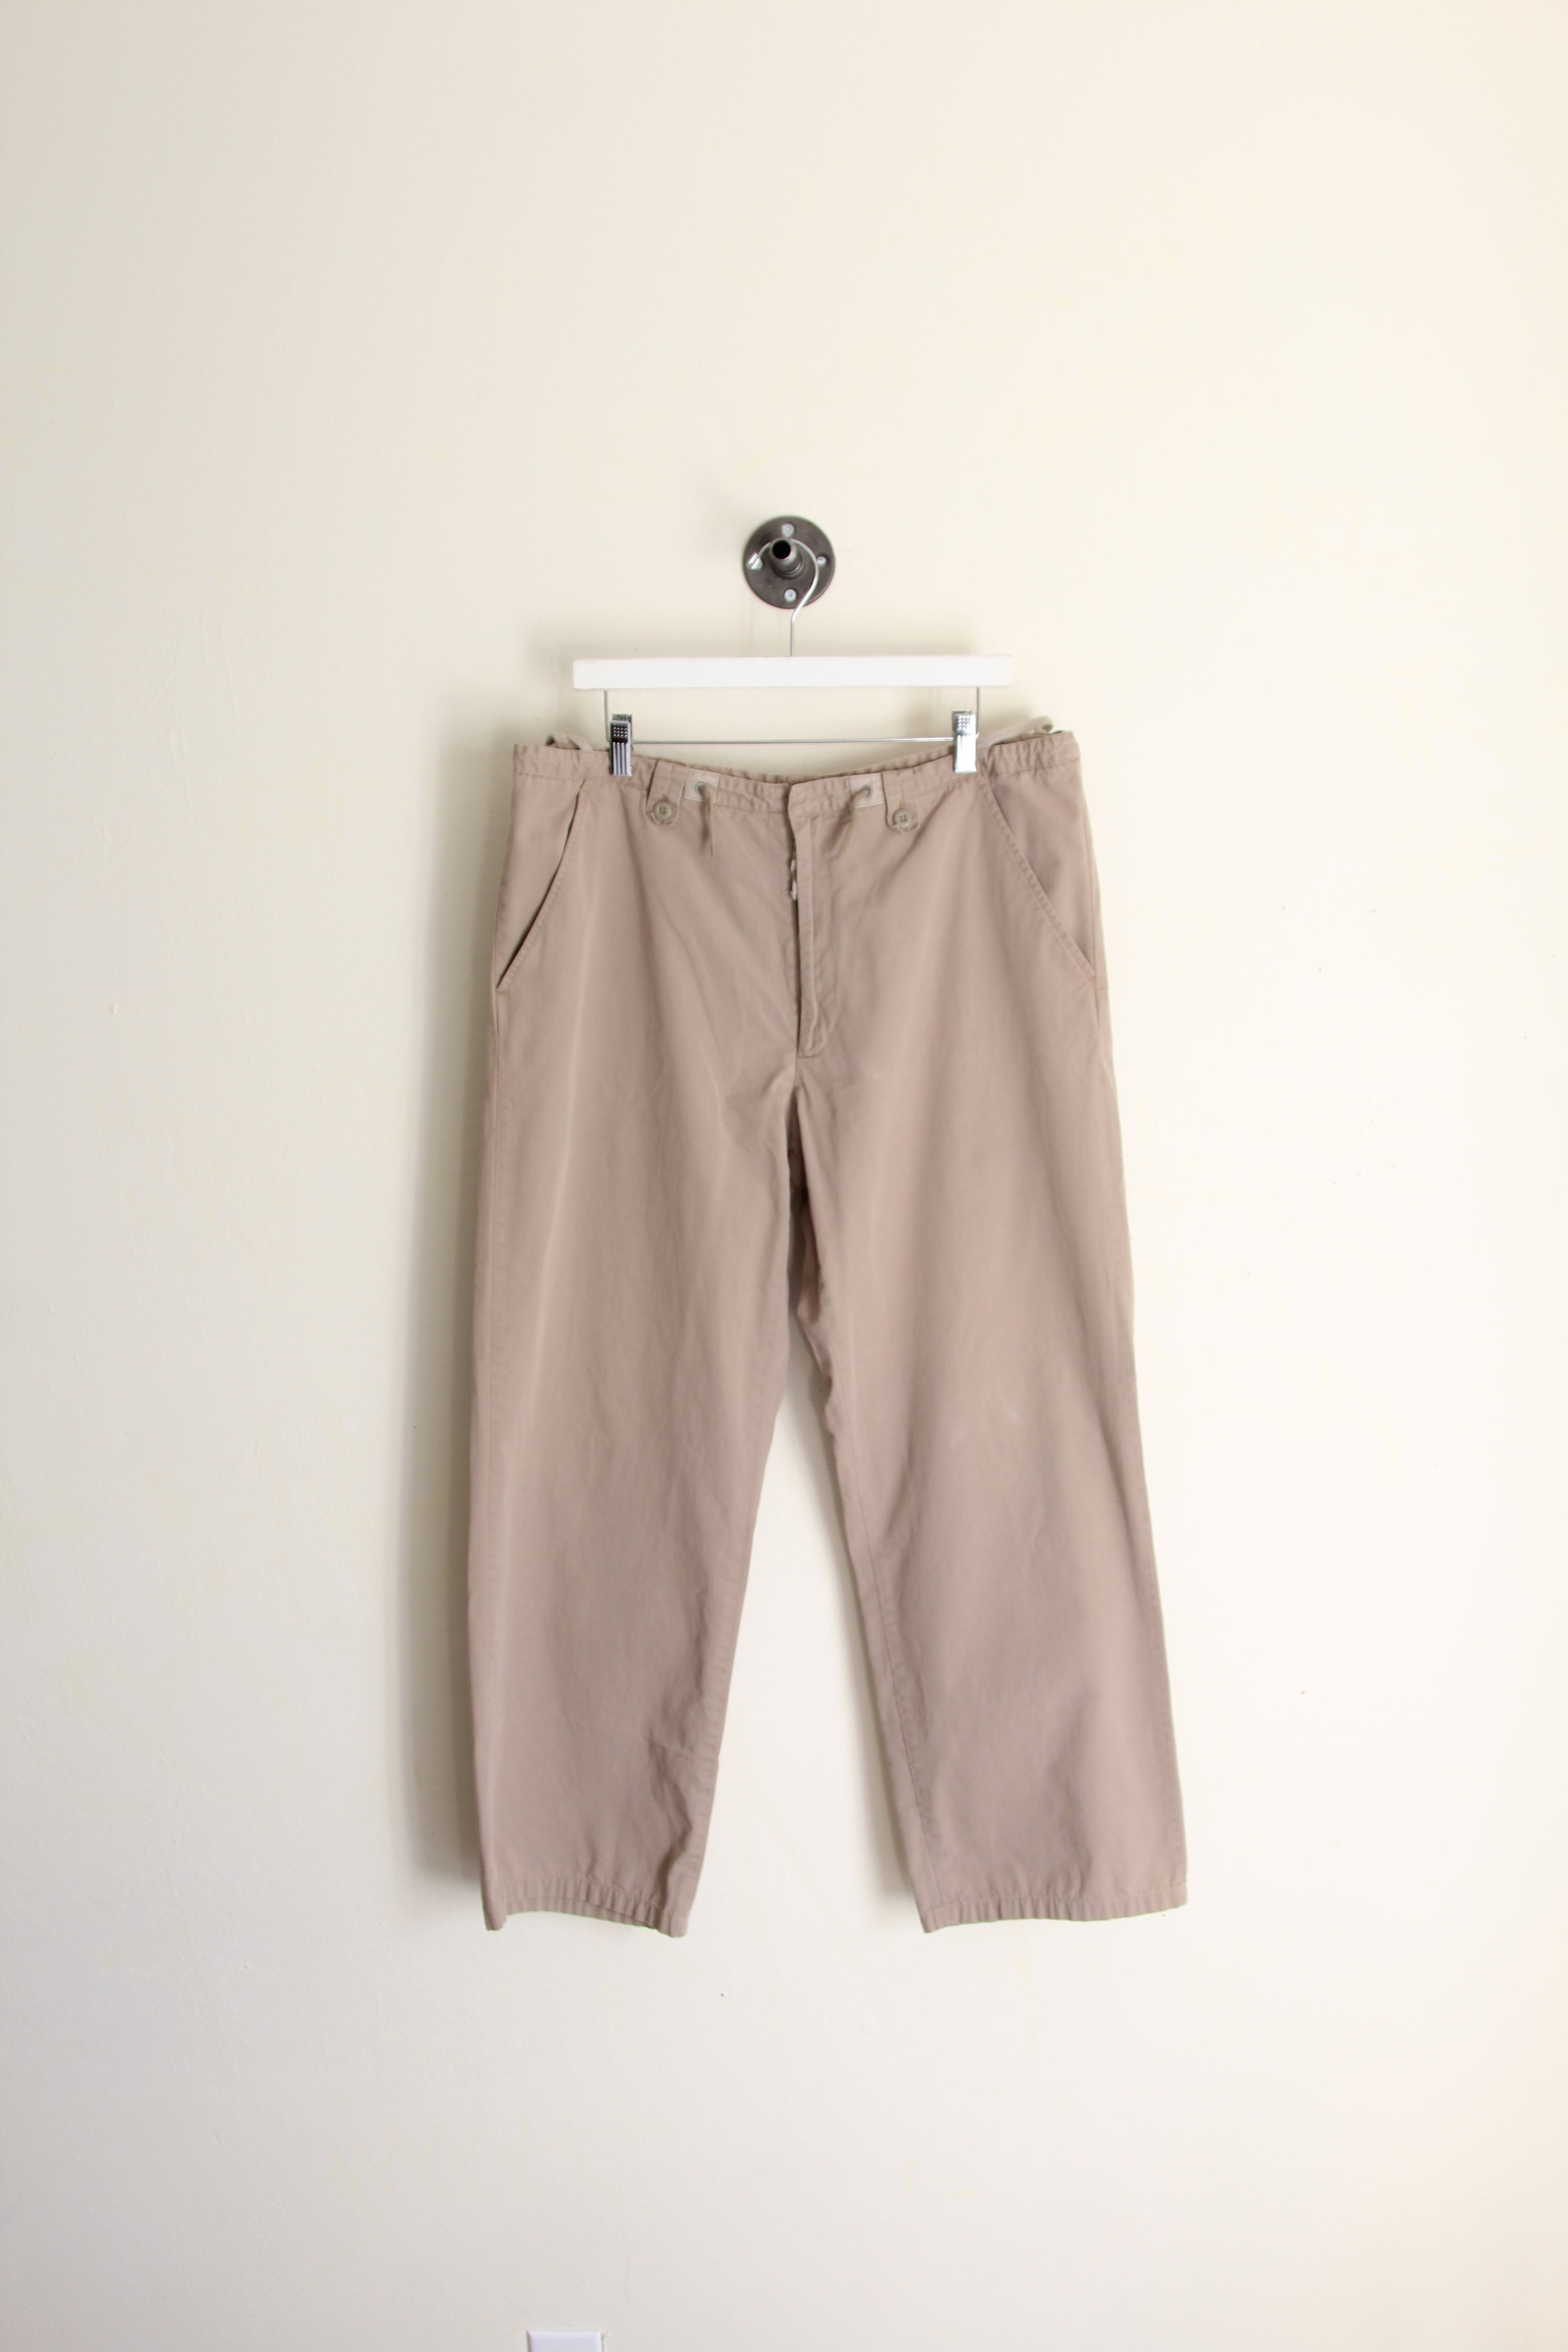 Helmut Lang AW 1999 Cropped Drawstring Trouser